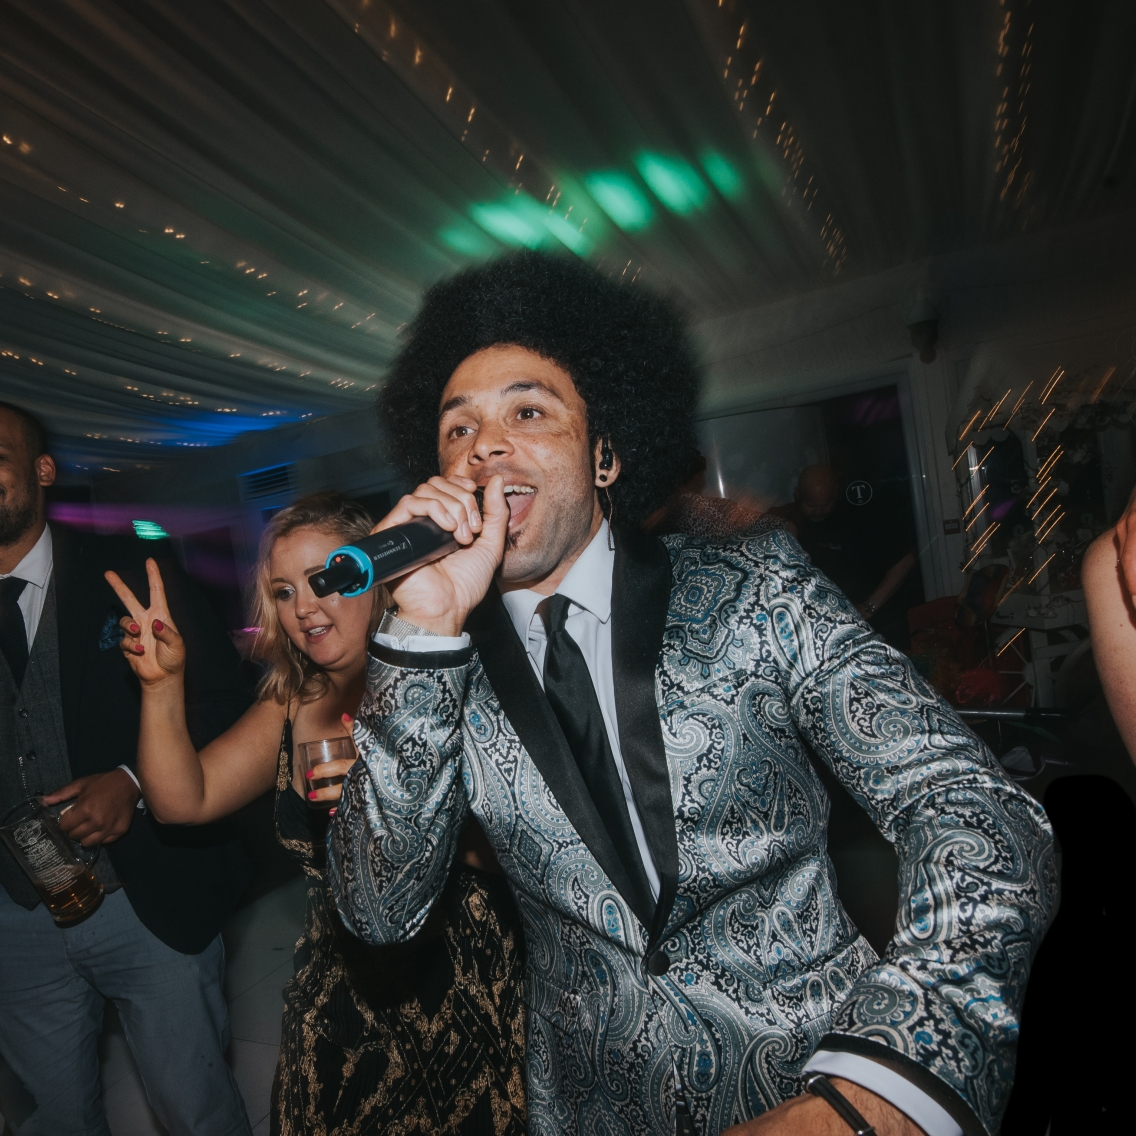 Lead singer dancing in crowd at wedding